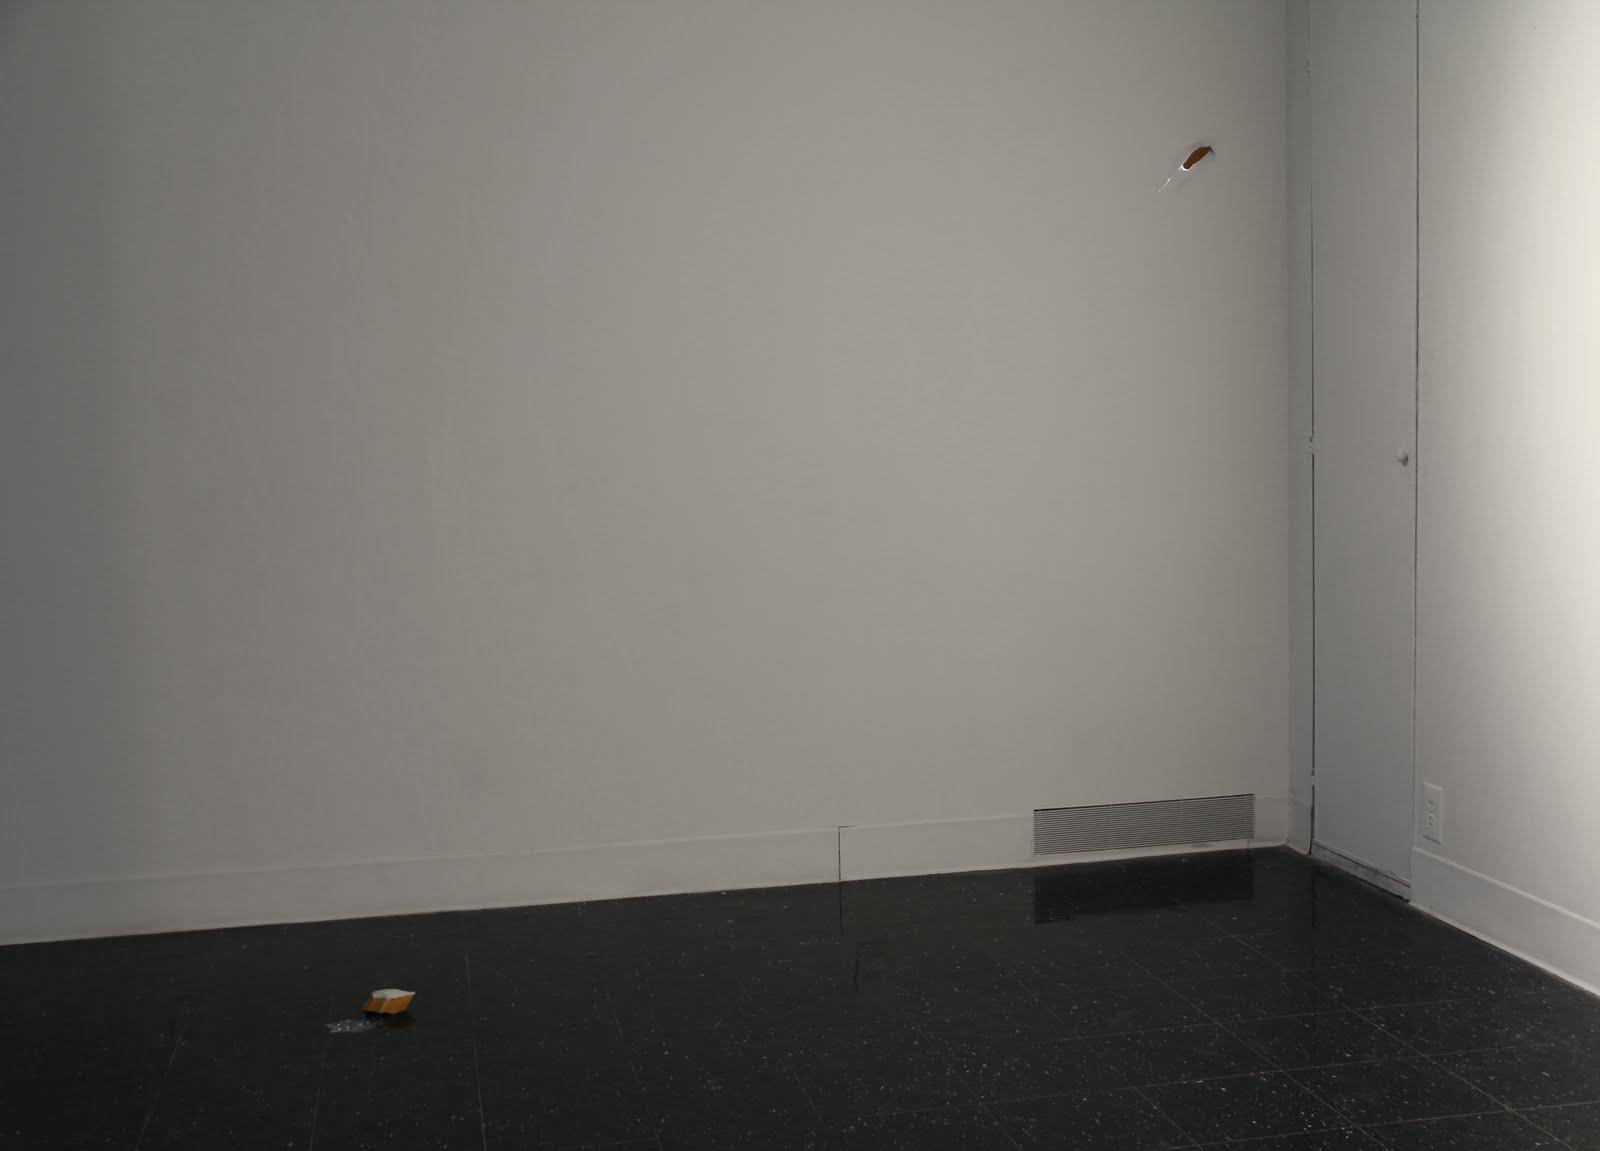 oskar painter thesis